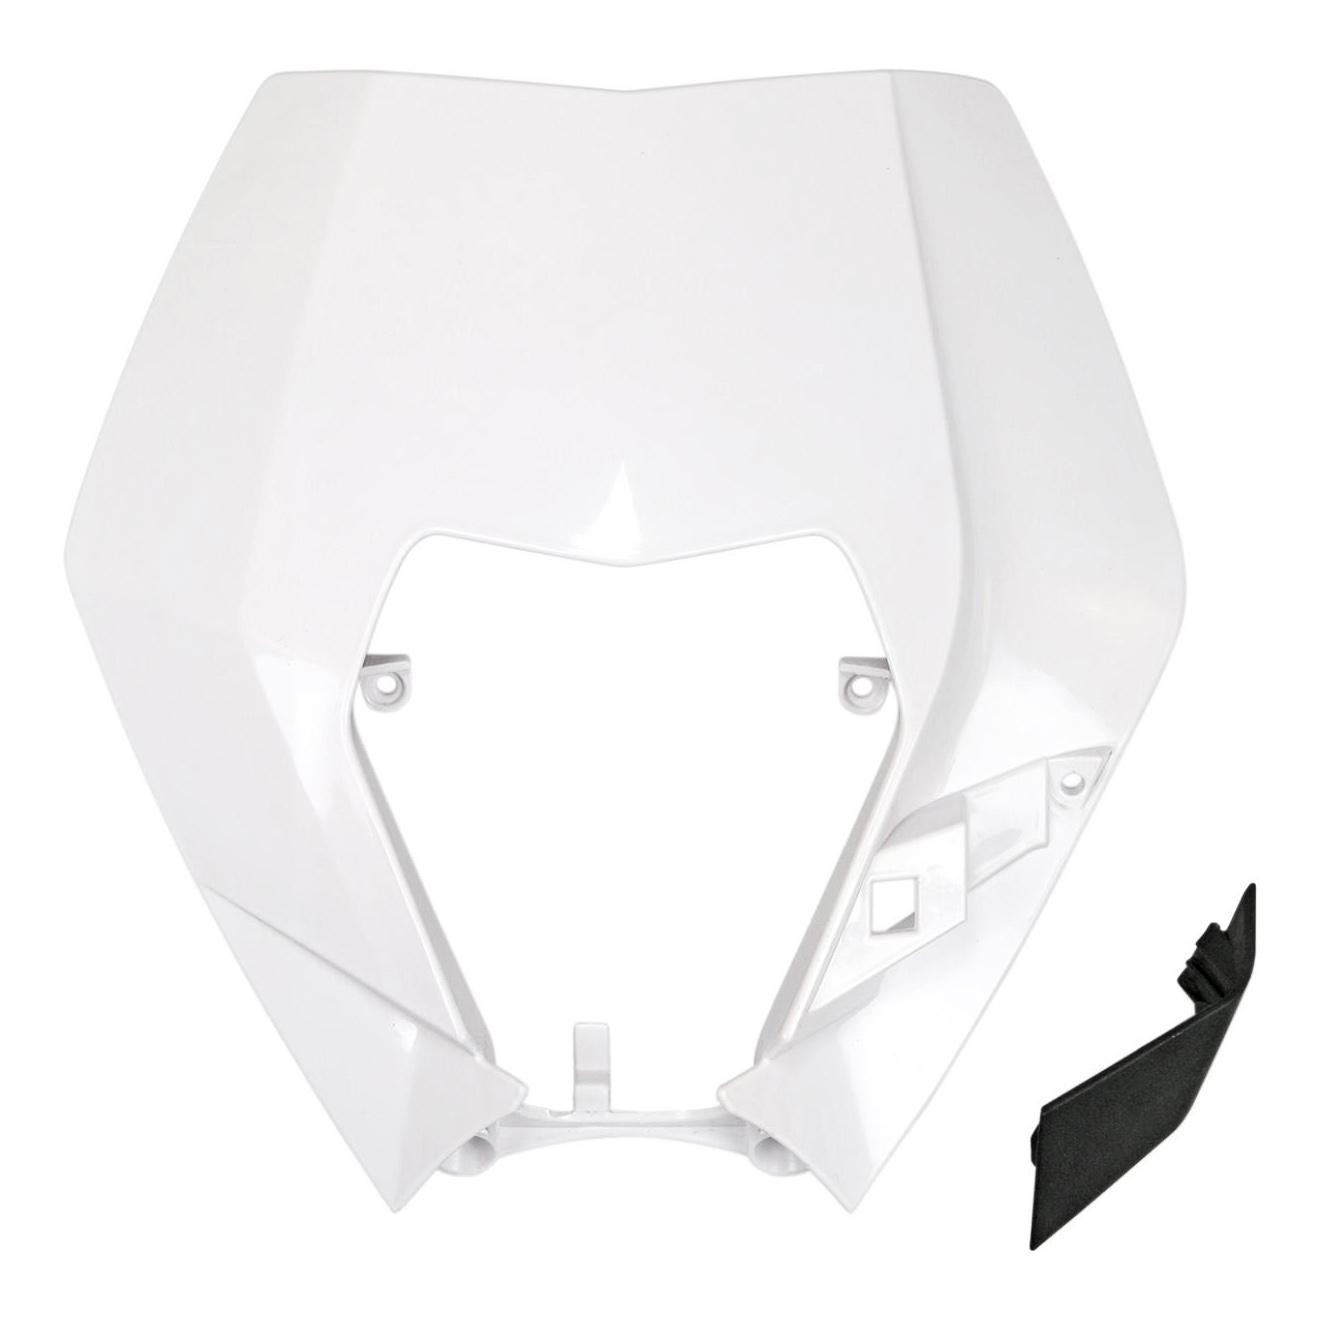 Plastique plaque phare UFO KTM 250 EXC-F 09-13 blanc (blanc KTM)